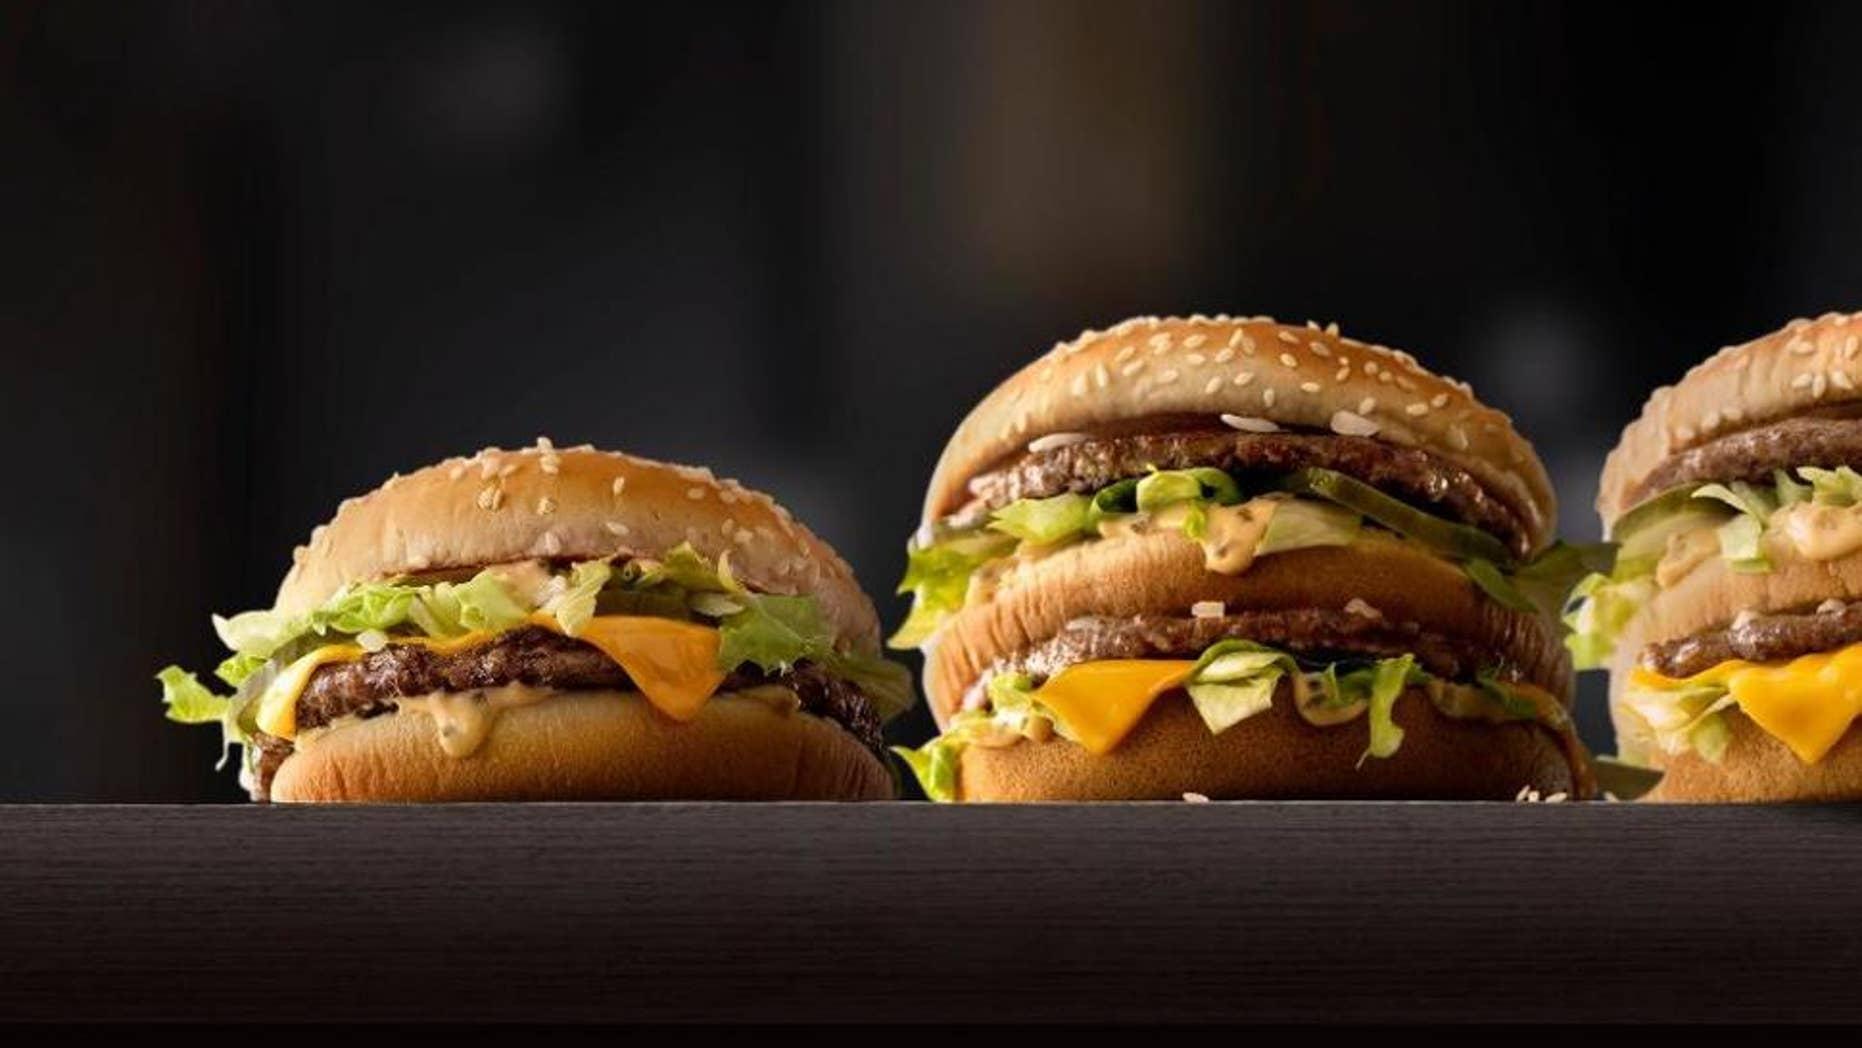 McDonald's is testing fresh beef patties in its bigger burgers.